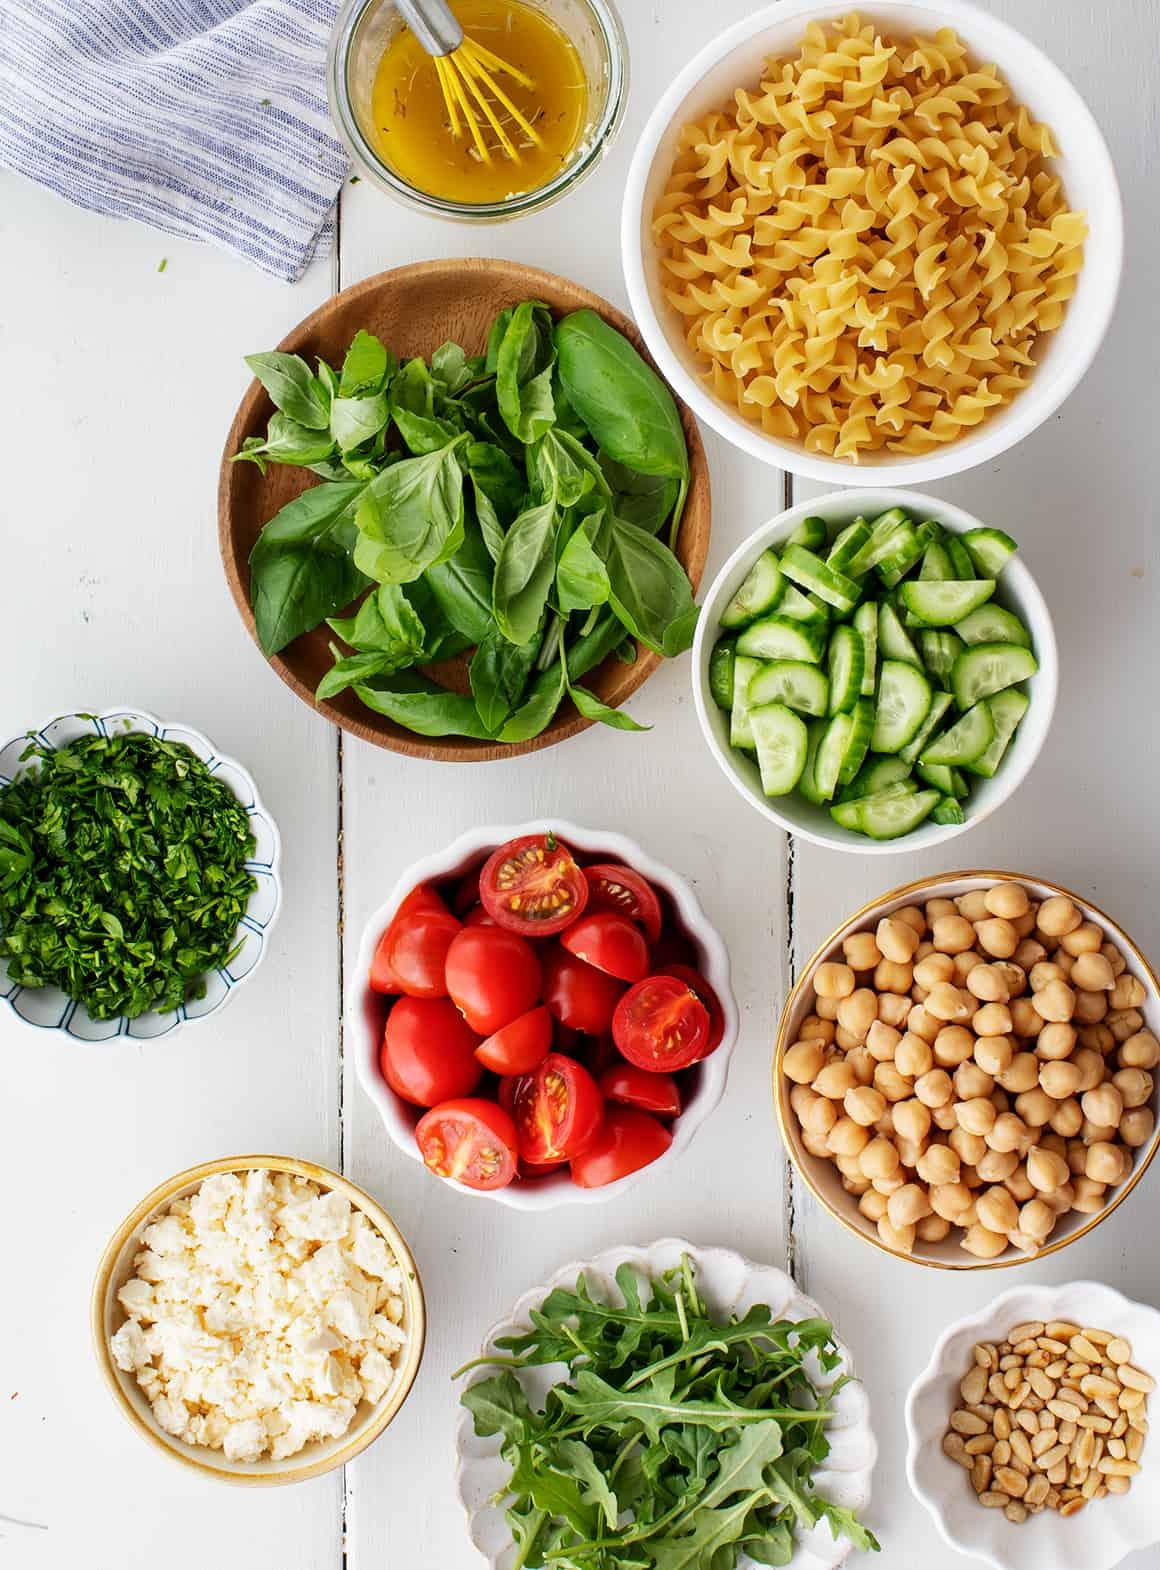 Easy pasta salad recipe ingredients